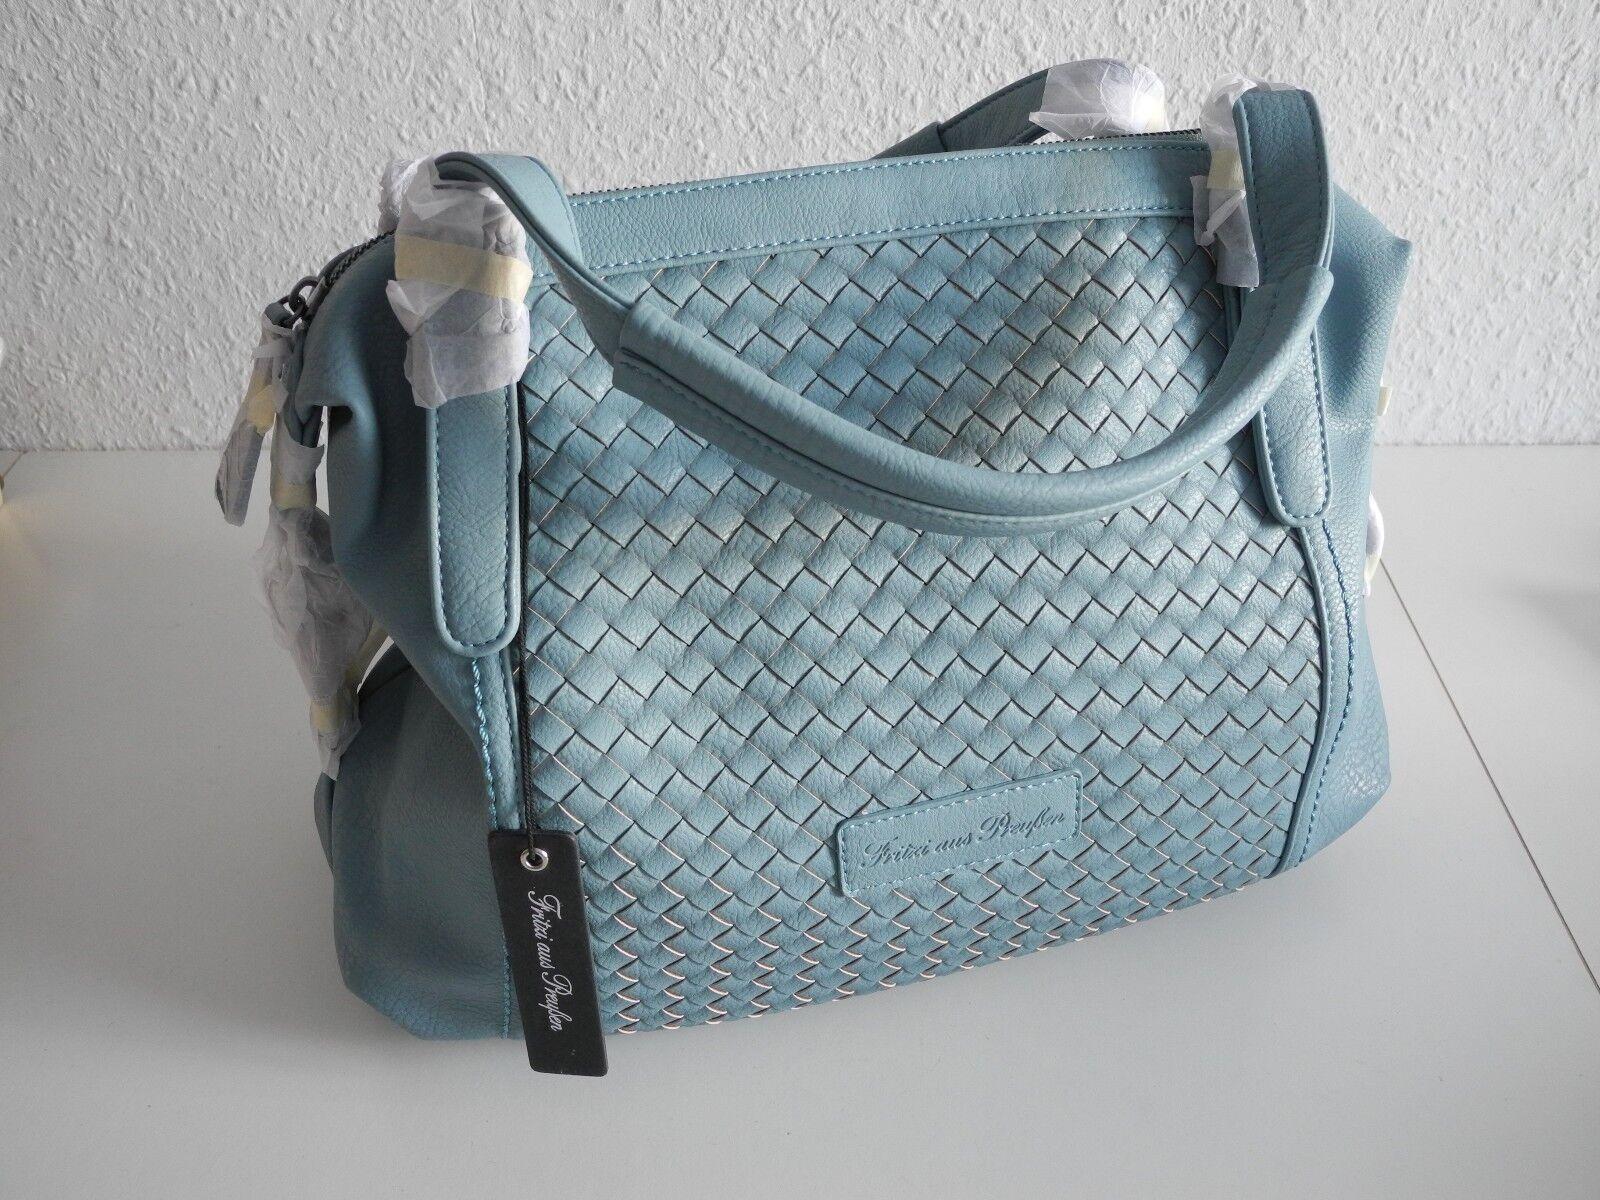 NEU Damen Handtasche Fritzi aus Preußen Frida Hellblau Sky geflochten | Neues Produkt